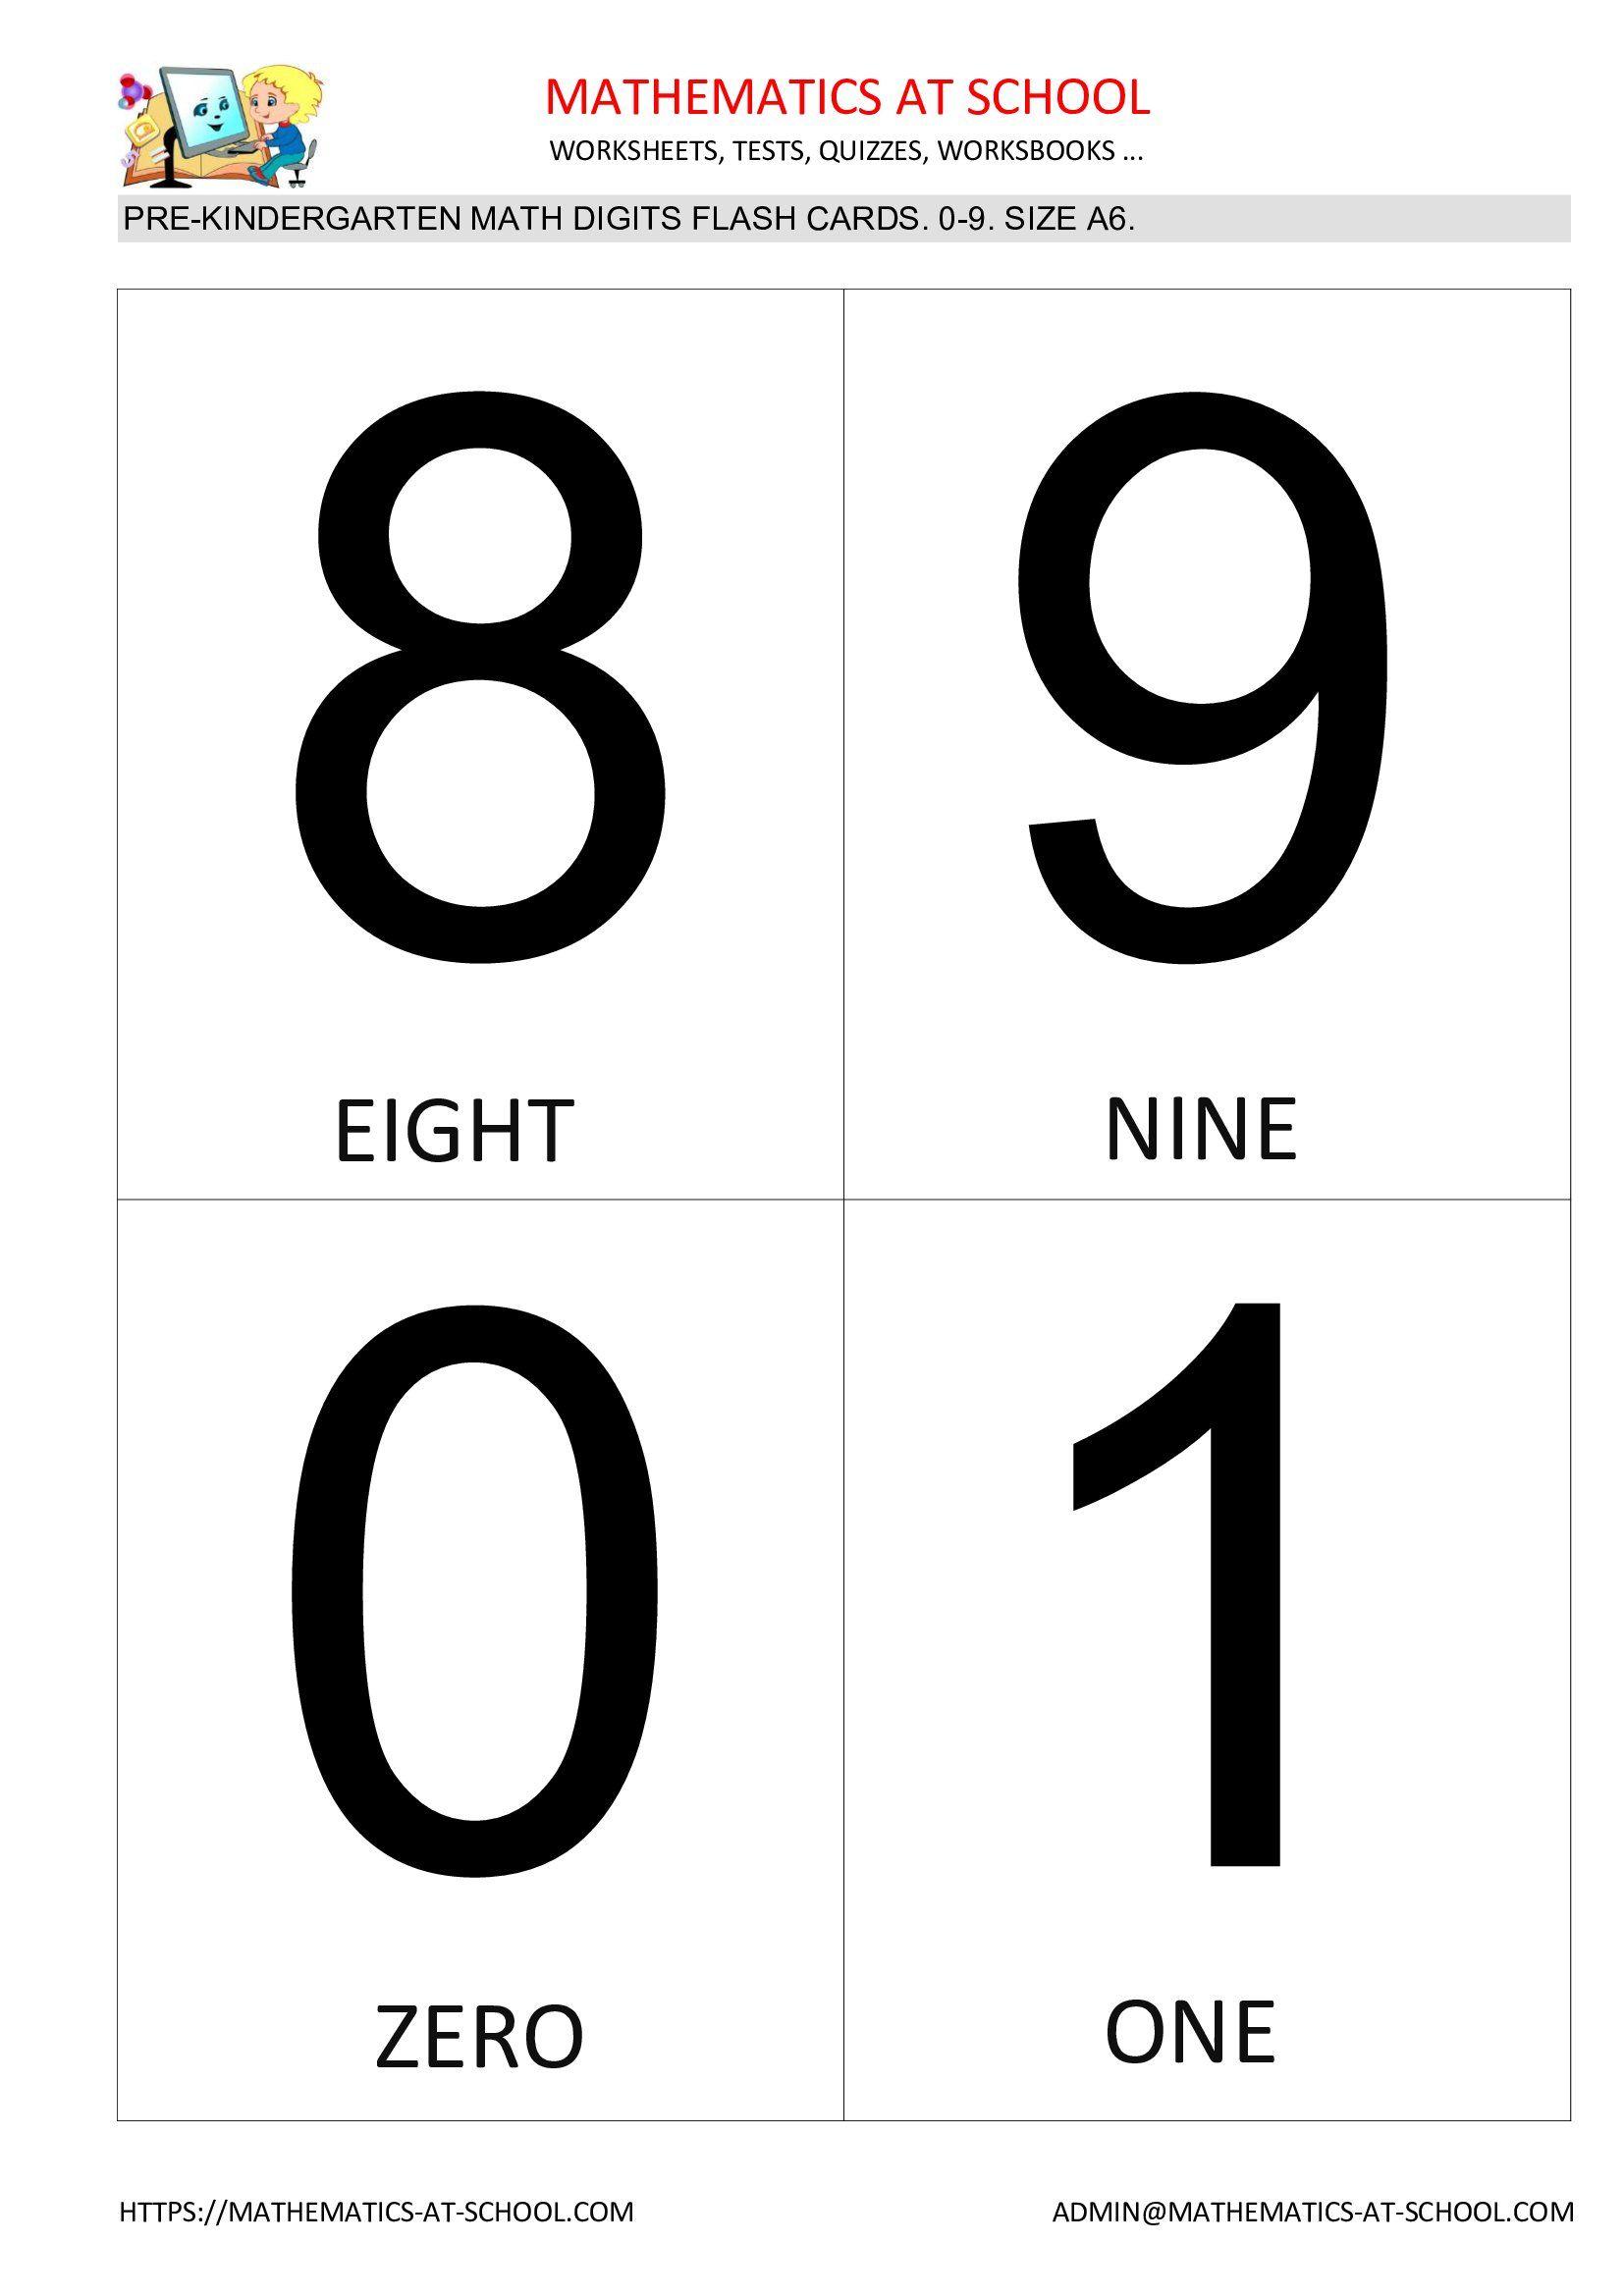 Pre Kindergarten Math Flash Cards Numbers 0 1 2 3 4